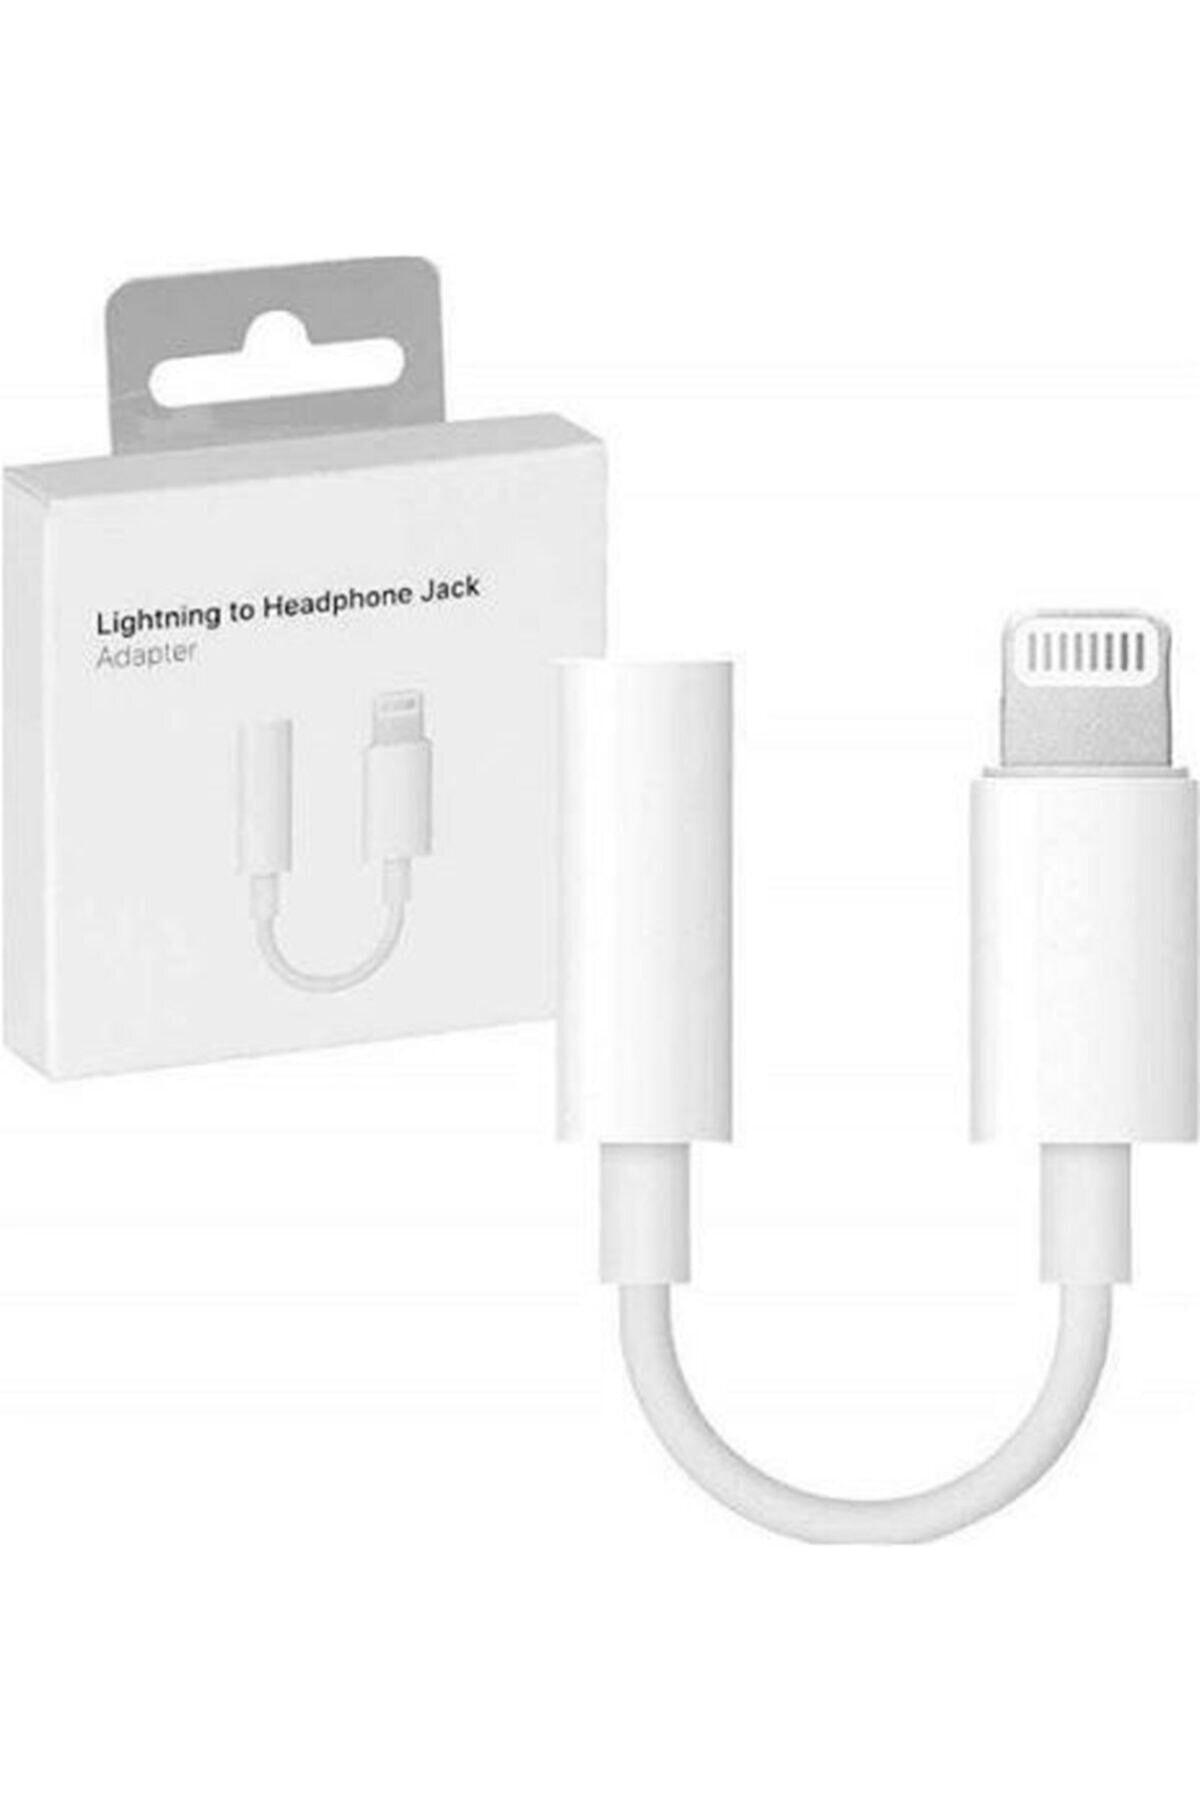 Di Aksesuar Iphone 6 7 8 Plus X 11 Pro Max Aux Kulaklık Çevirici Kablo Adaptör Bluetooth Bağlantı